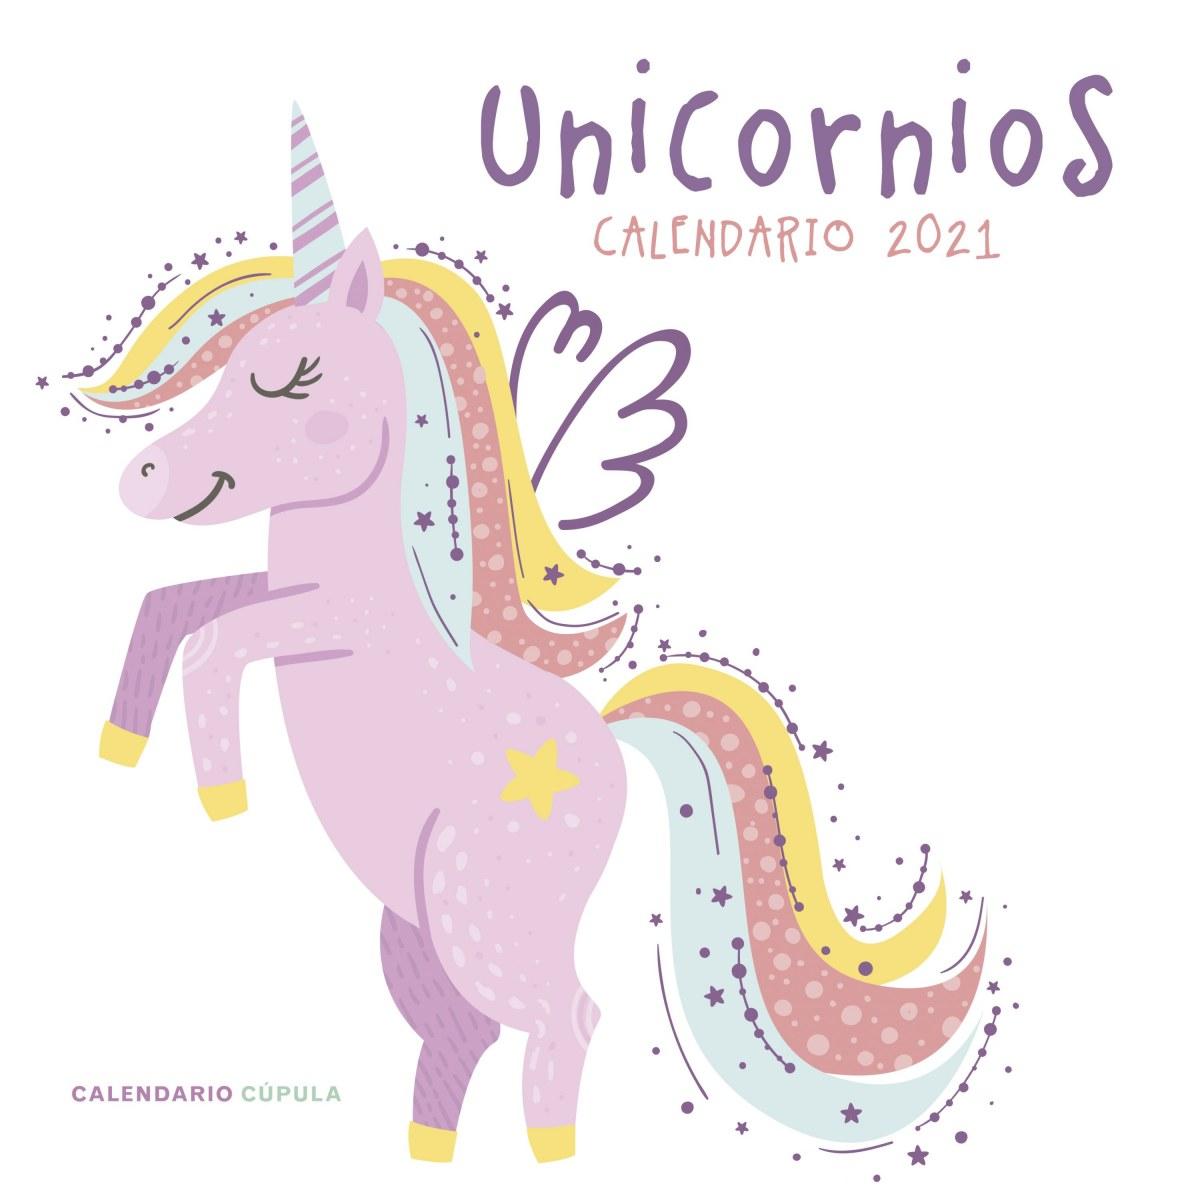 Calendario Unicornios 2021